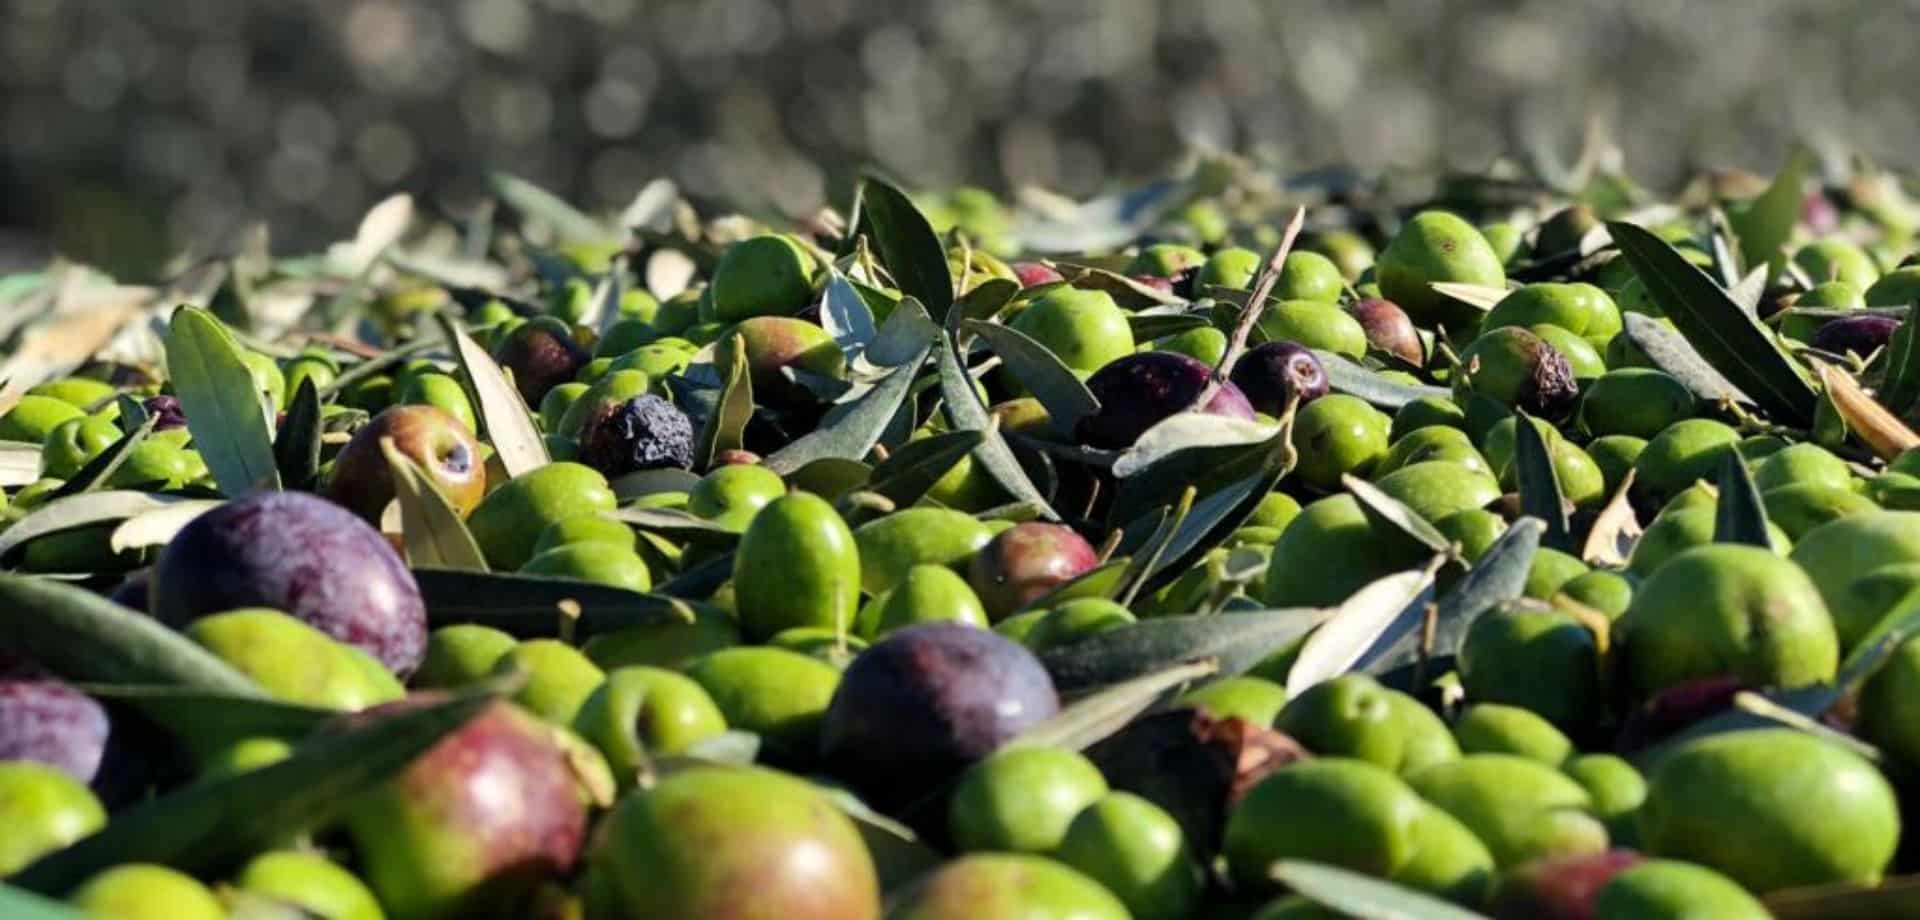 Vivi la raccolta olive a mano ad Agrigento